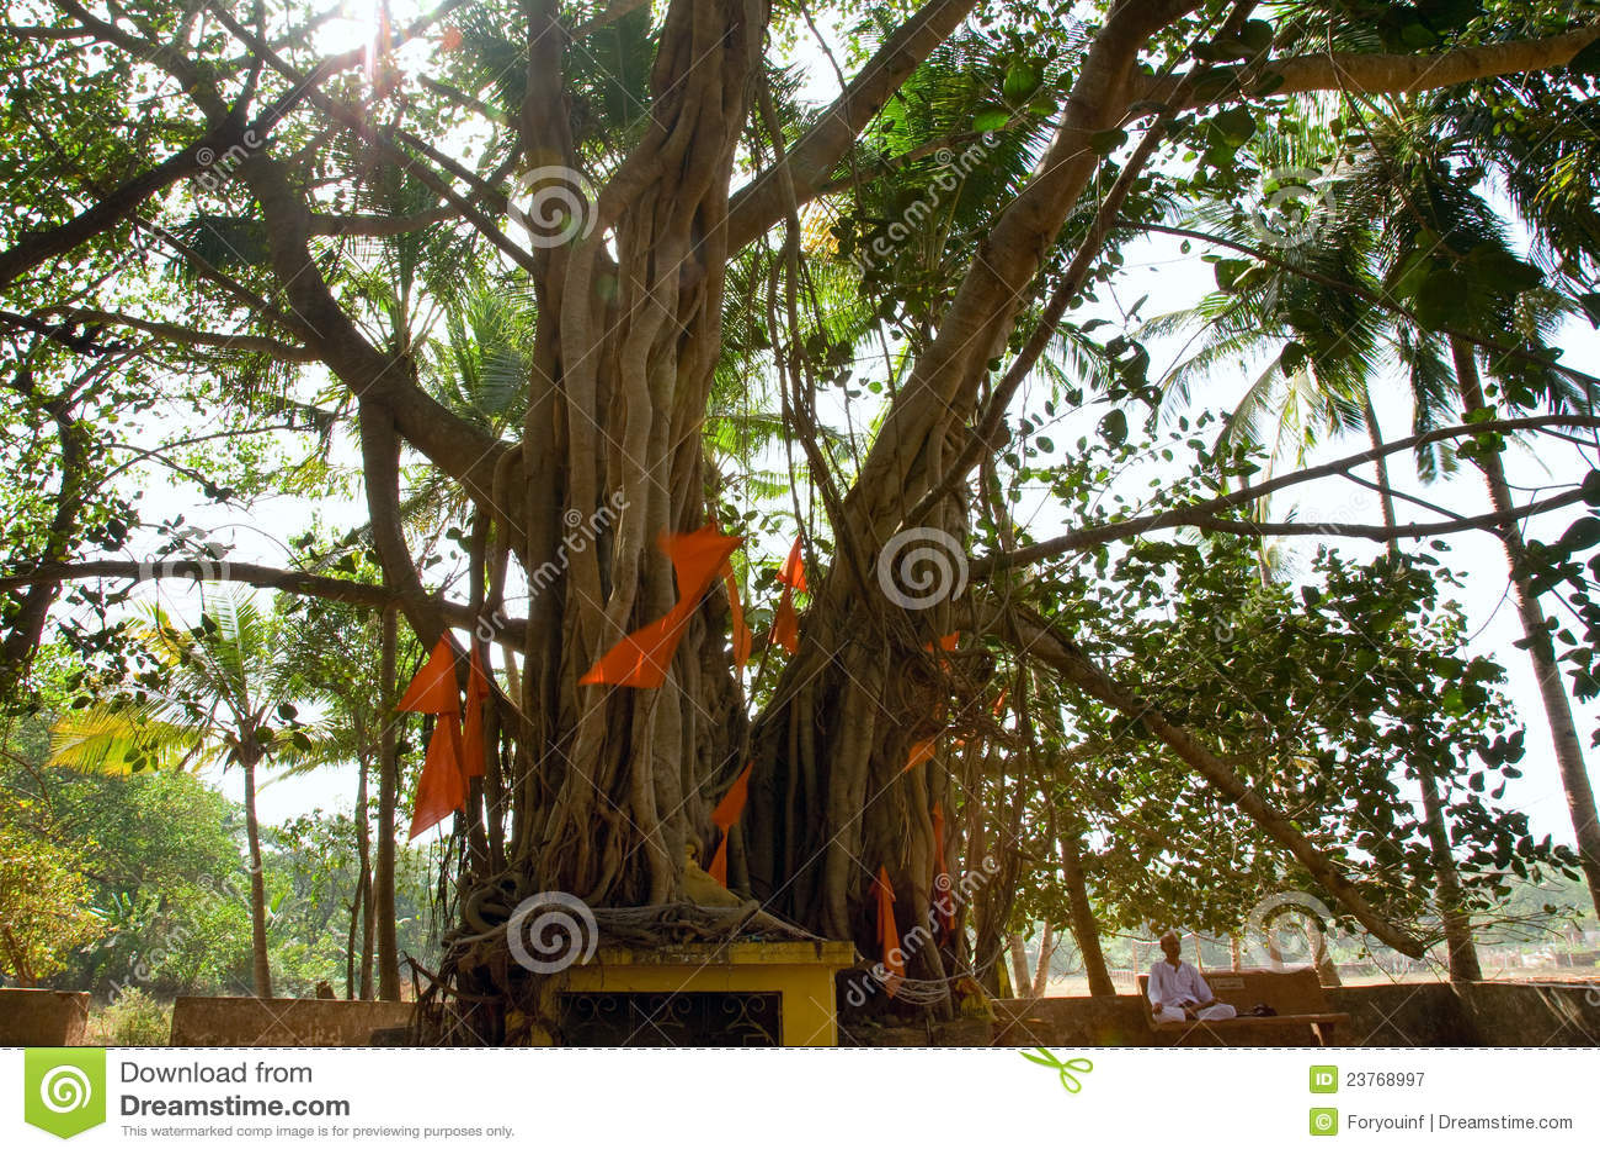 Indian man sitting near big banyan